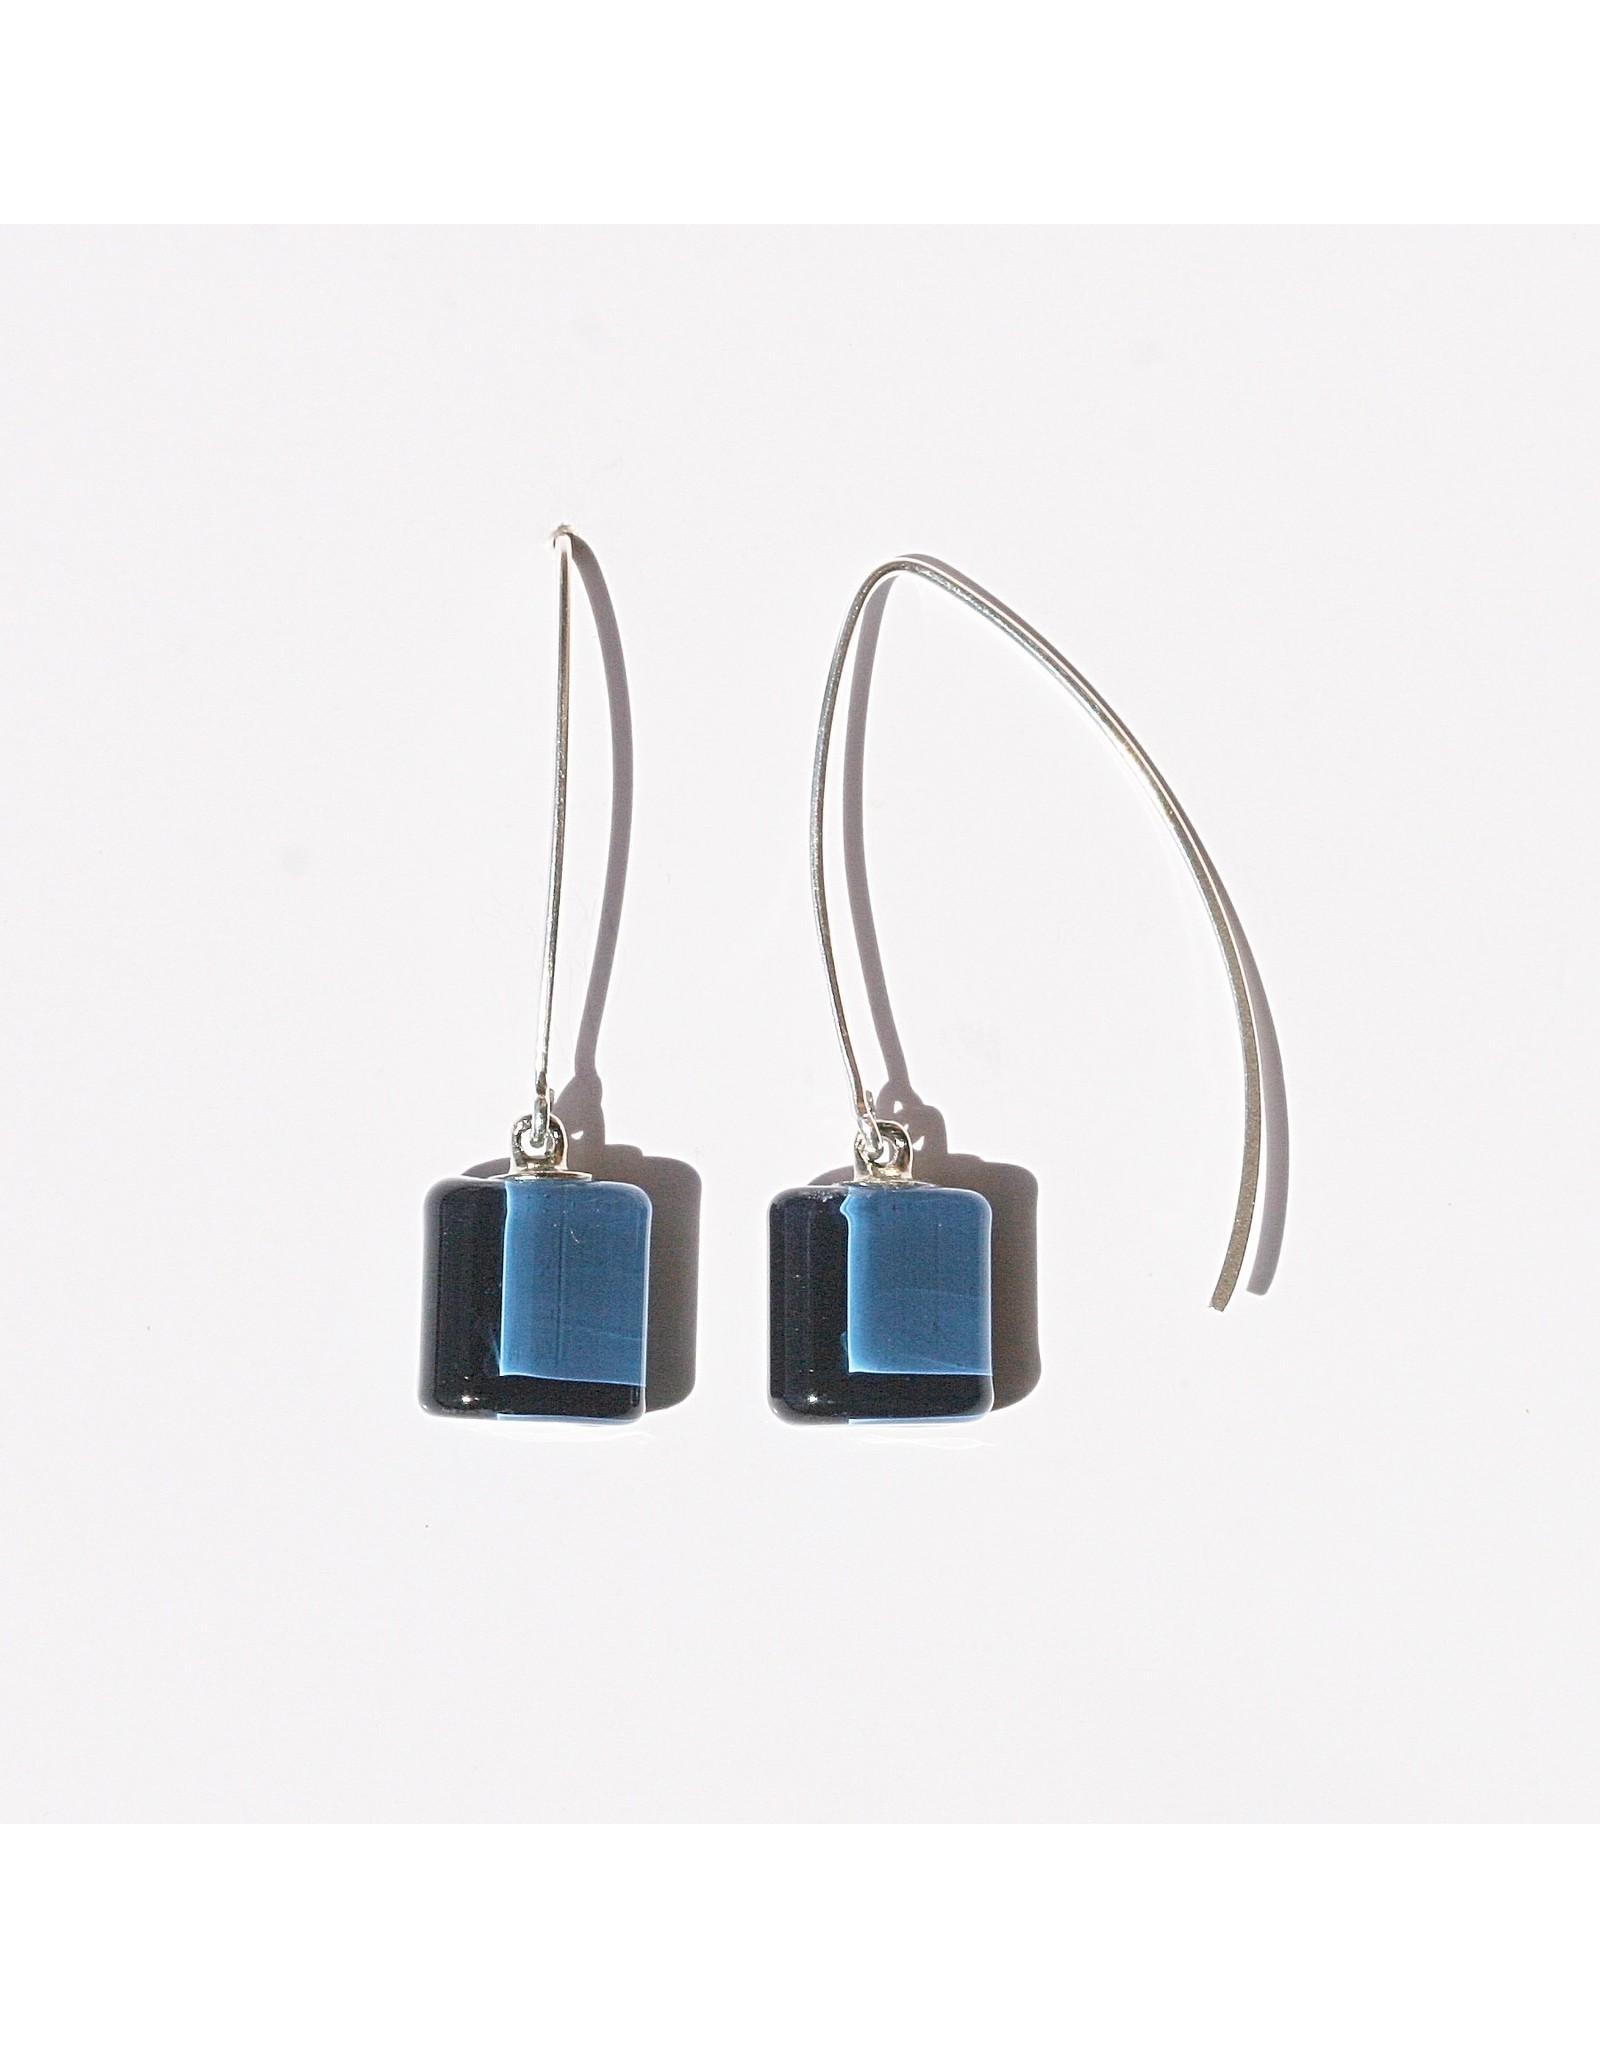 Perfecto Glass EARRING (Mini Square Dangle, PERF)